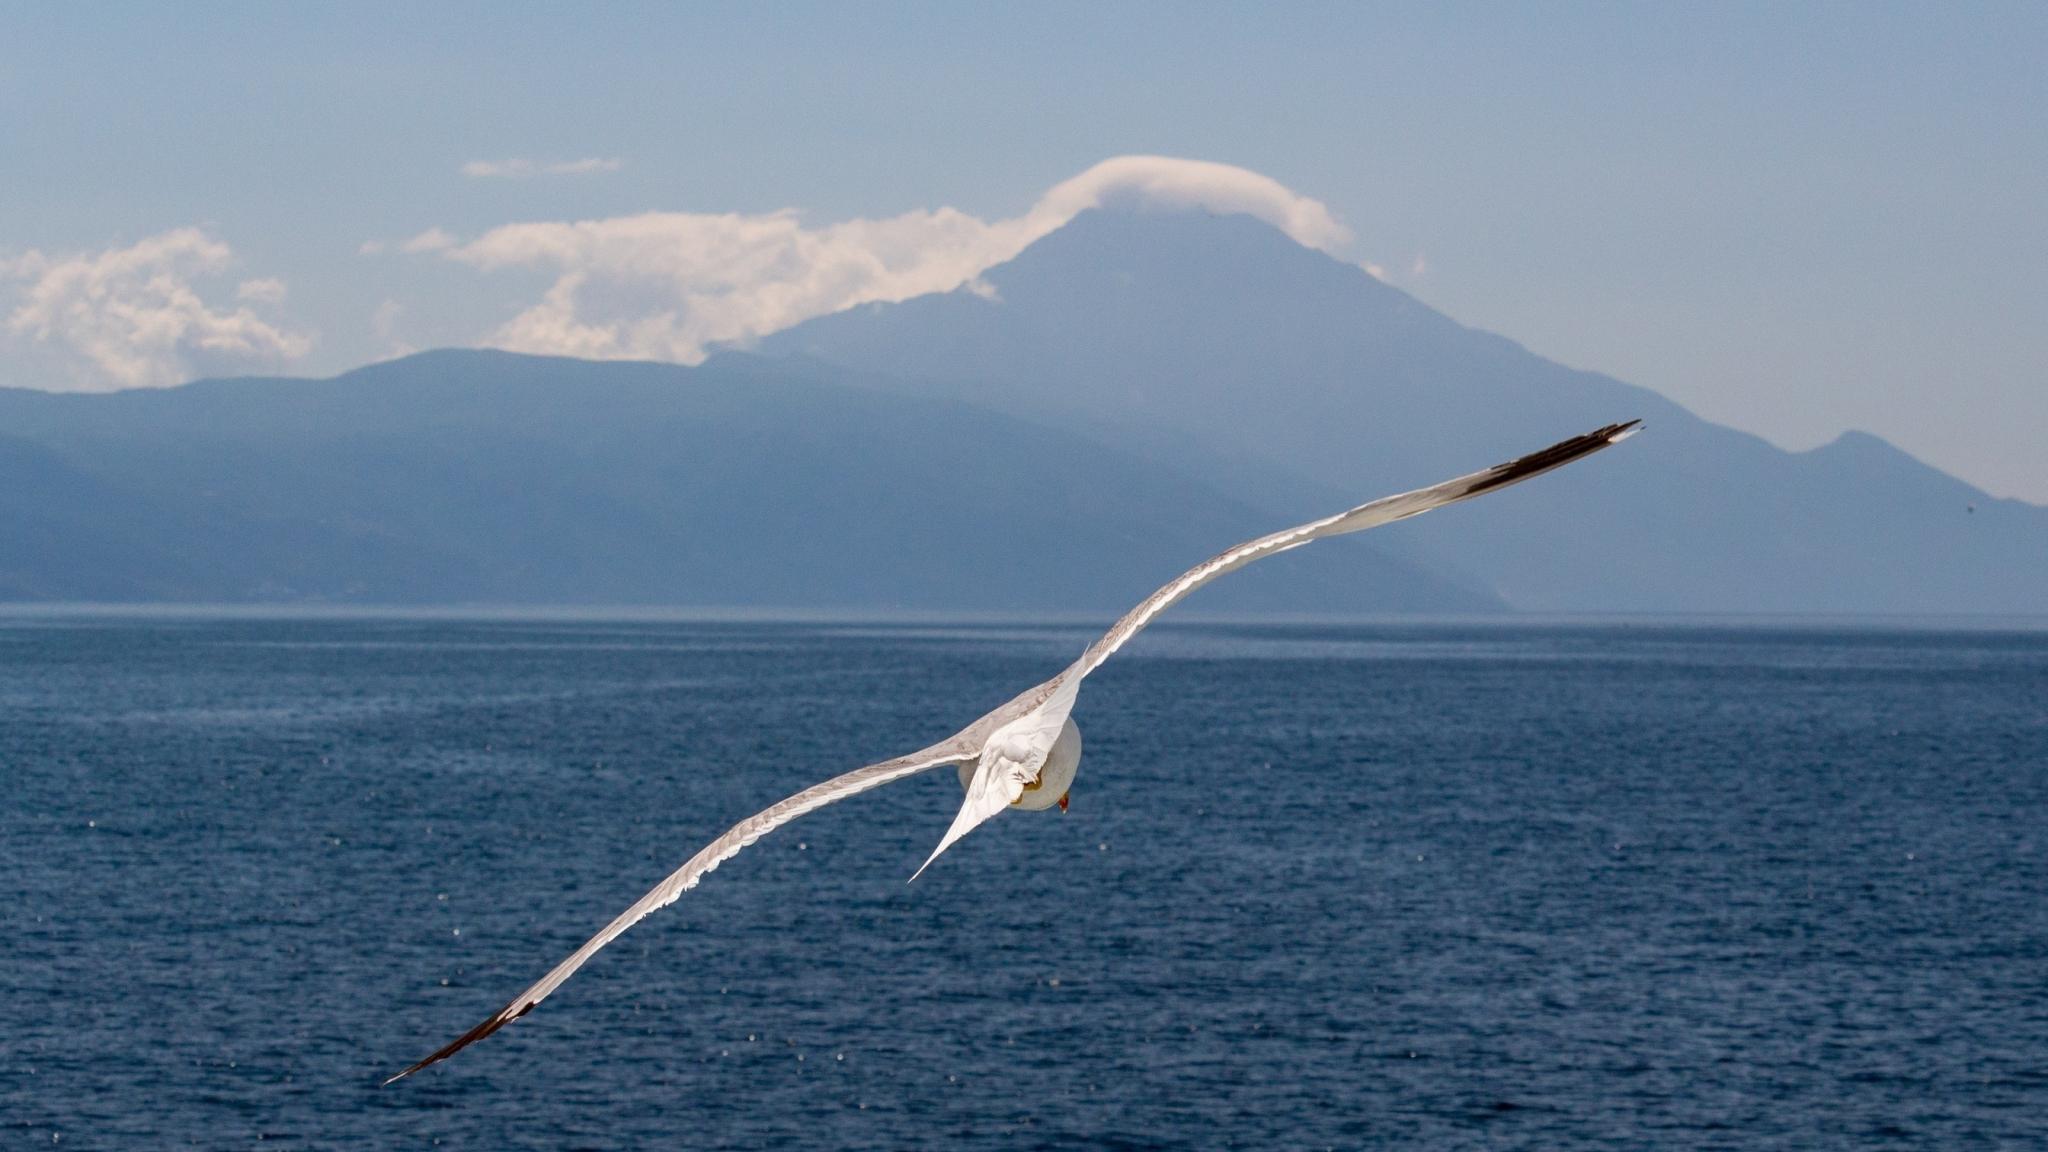 White bird, flight, sea, seagull, 2048x1152 wallpaper